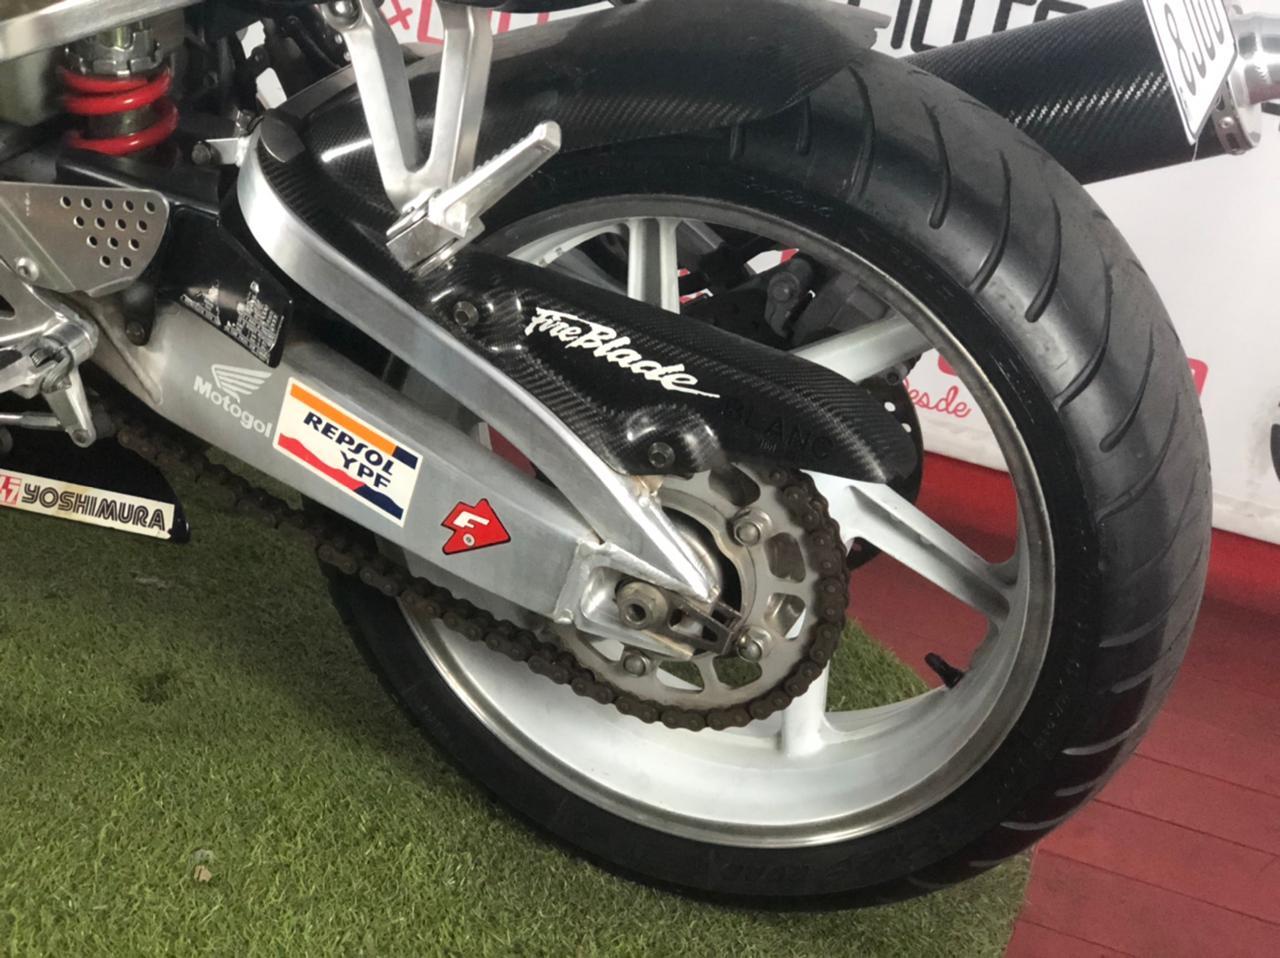 Honda - CBR 900RR FireBlade